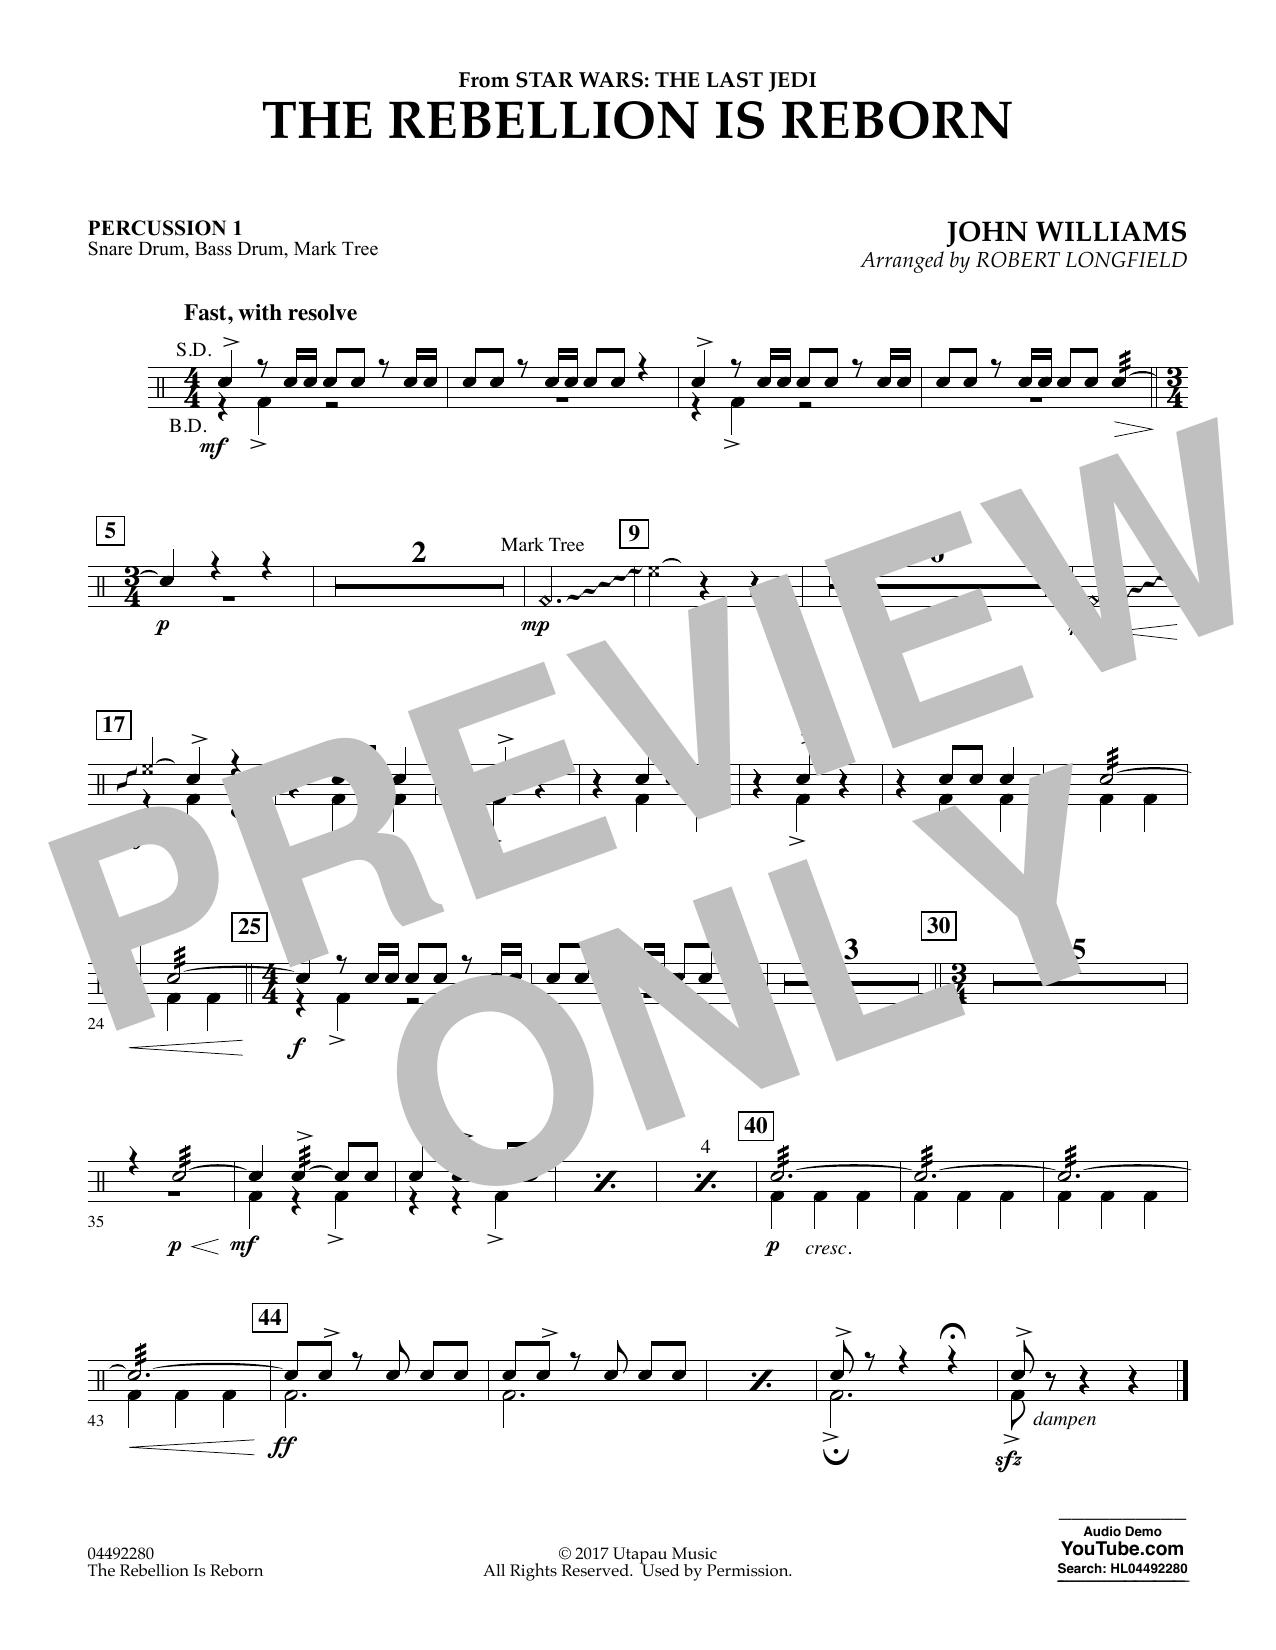 The Rebellion Is Reborn (from Star Wars: The Last Jedi) - Percussion 1 (Orchestra)